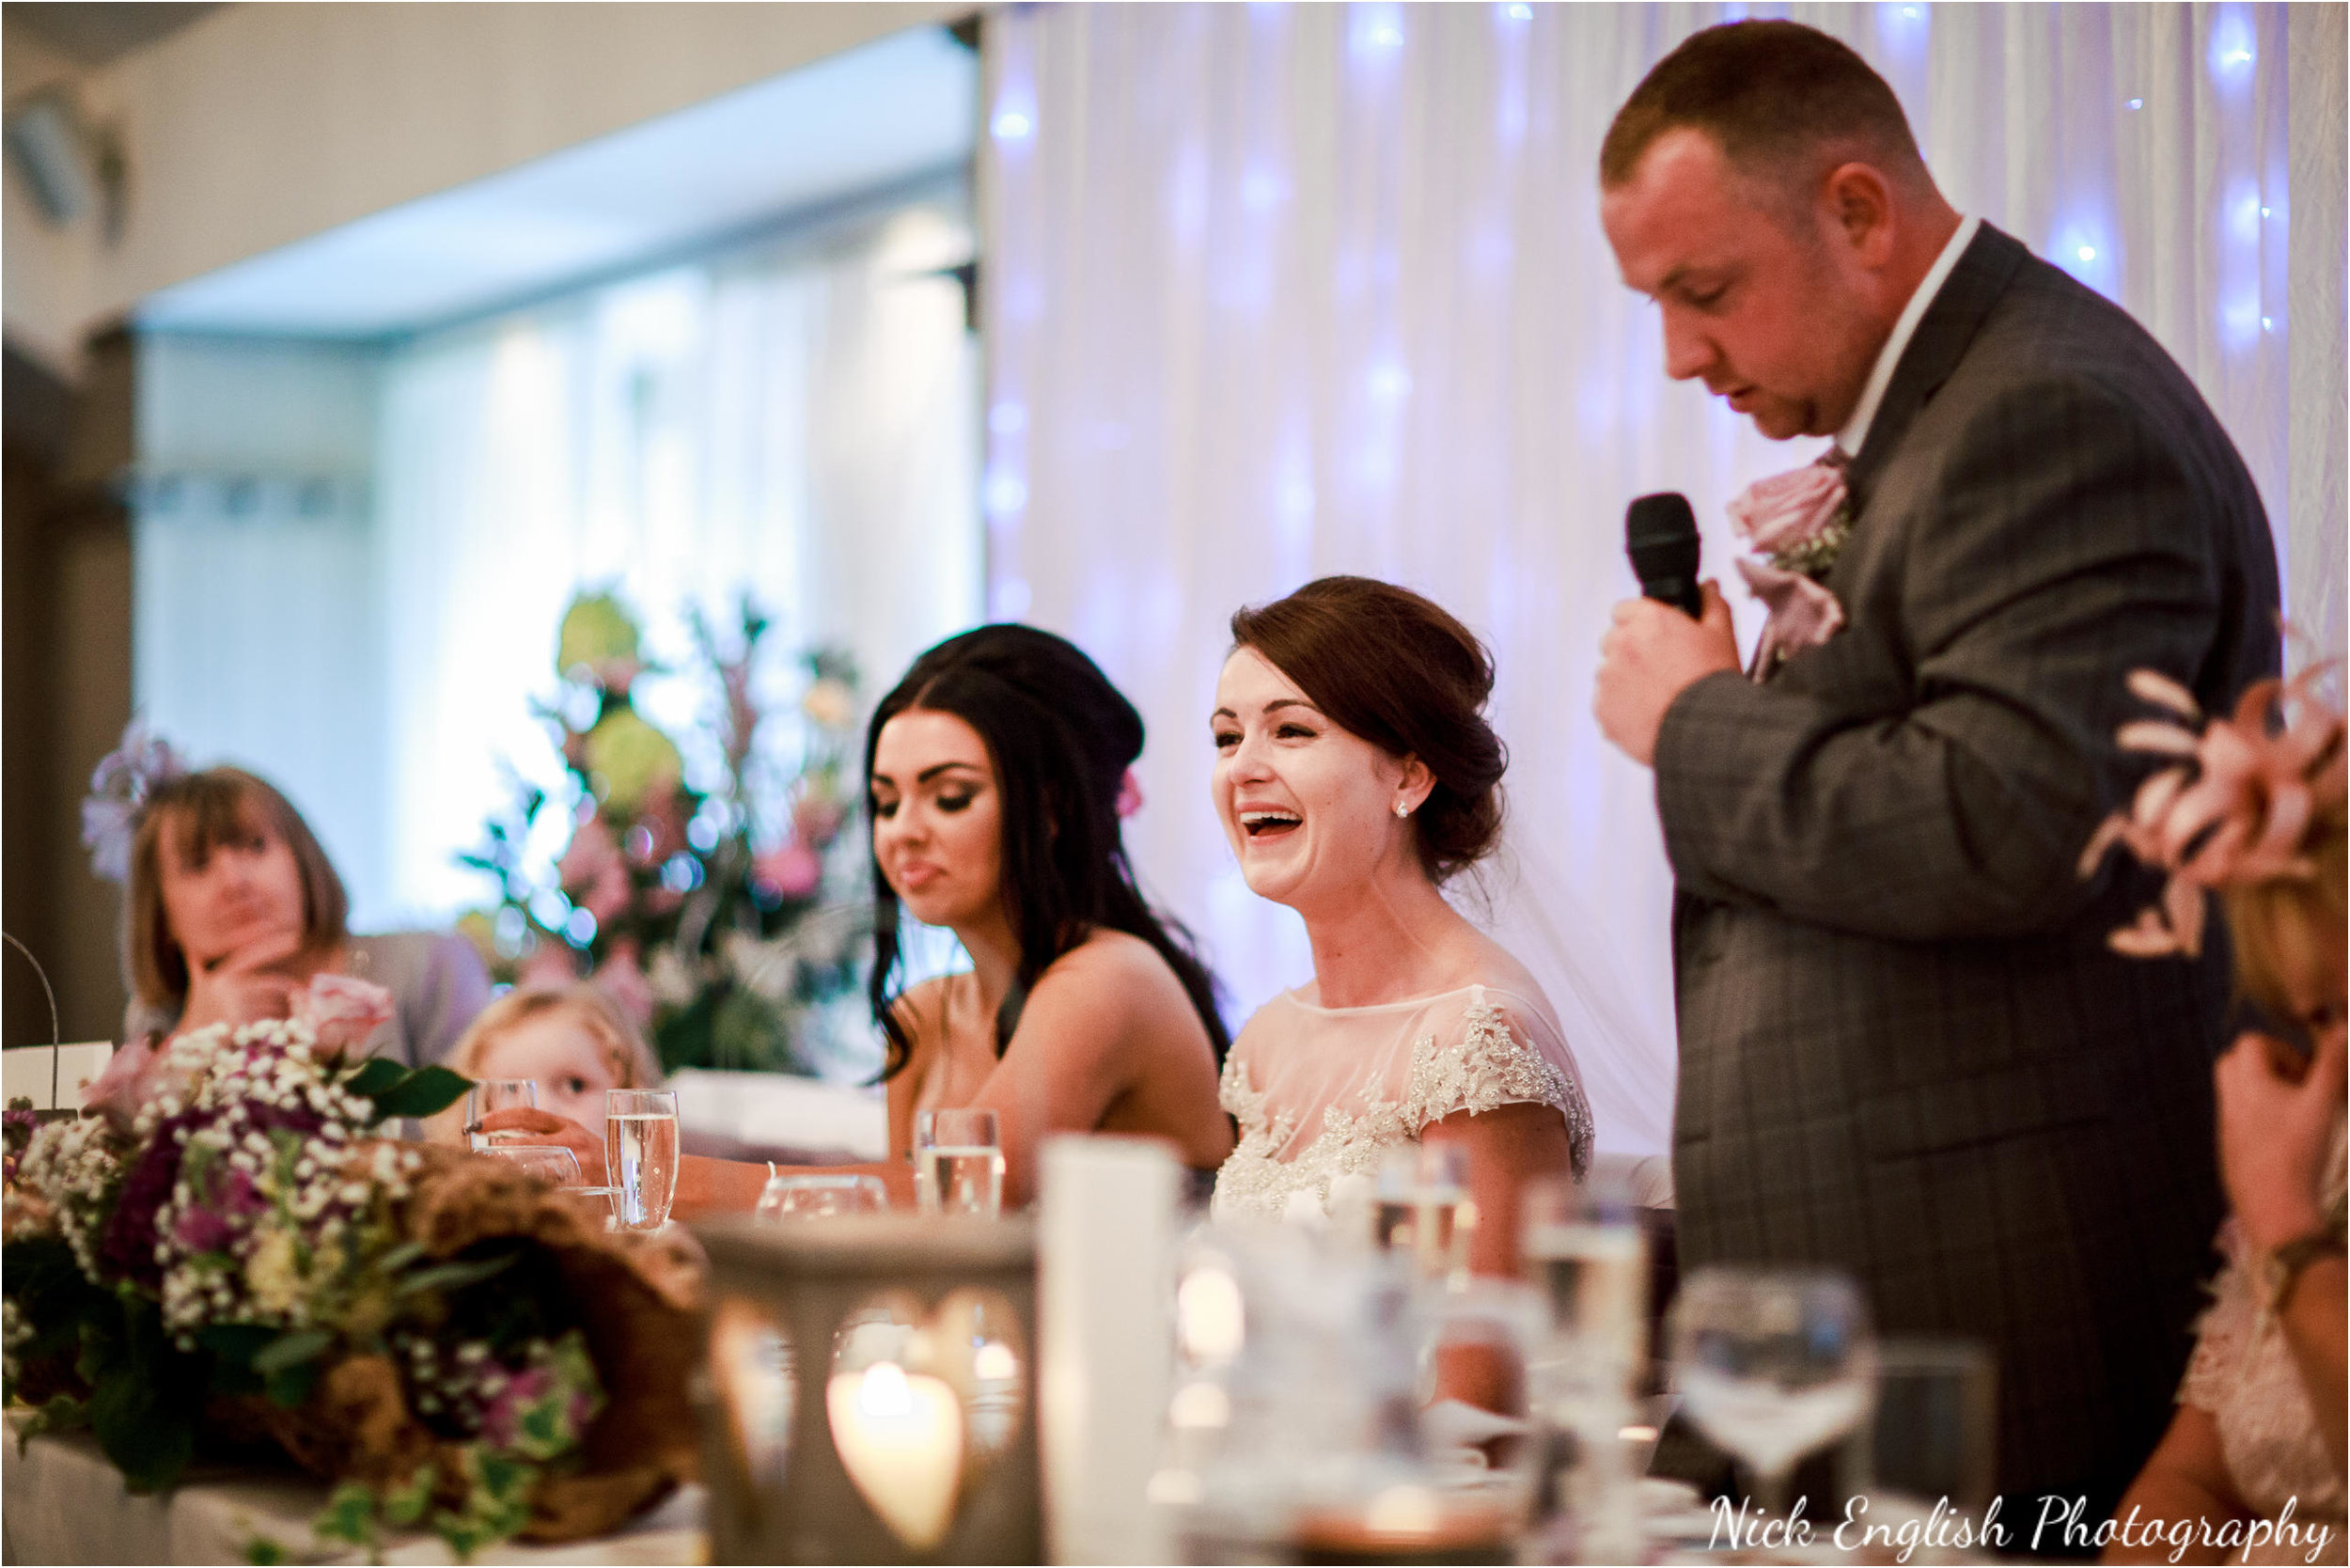 Stacey-Ash-Wedding-Photographs-Stanley-House-Preston-Lancashire-171.jpg